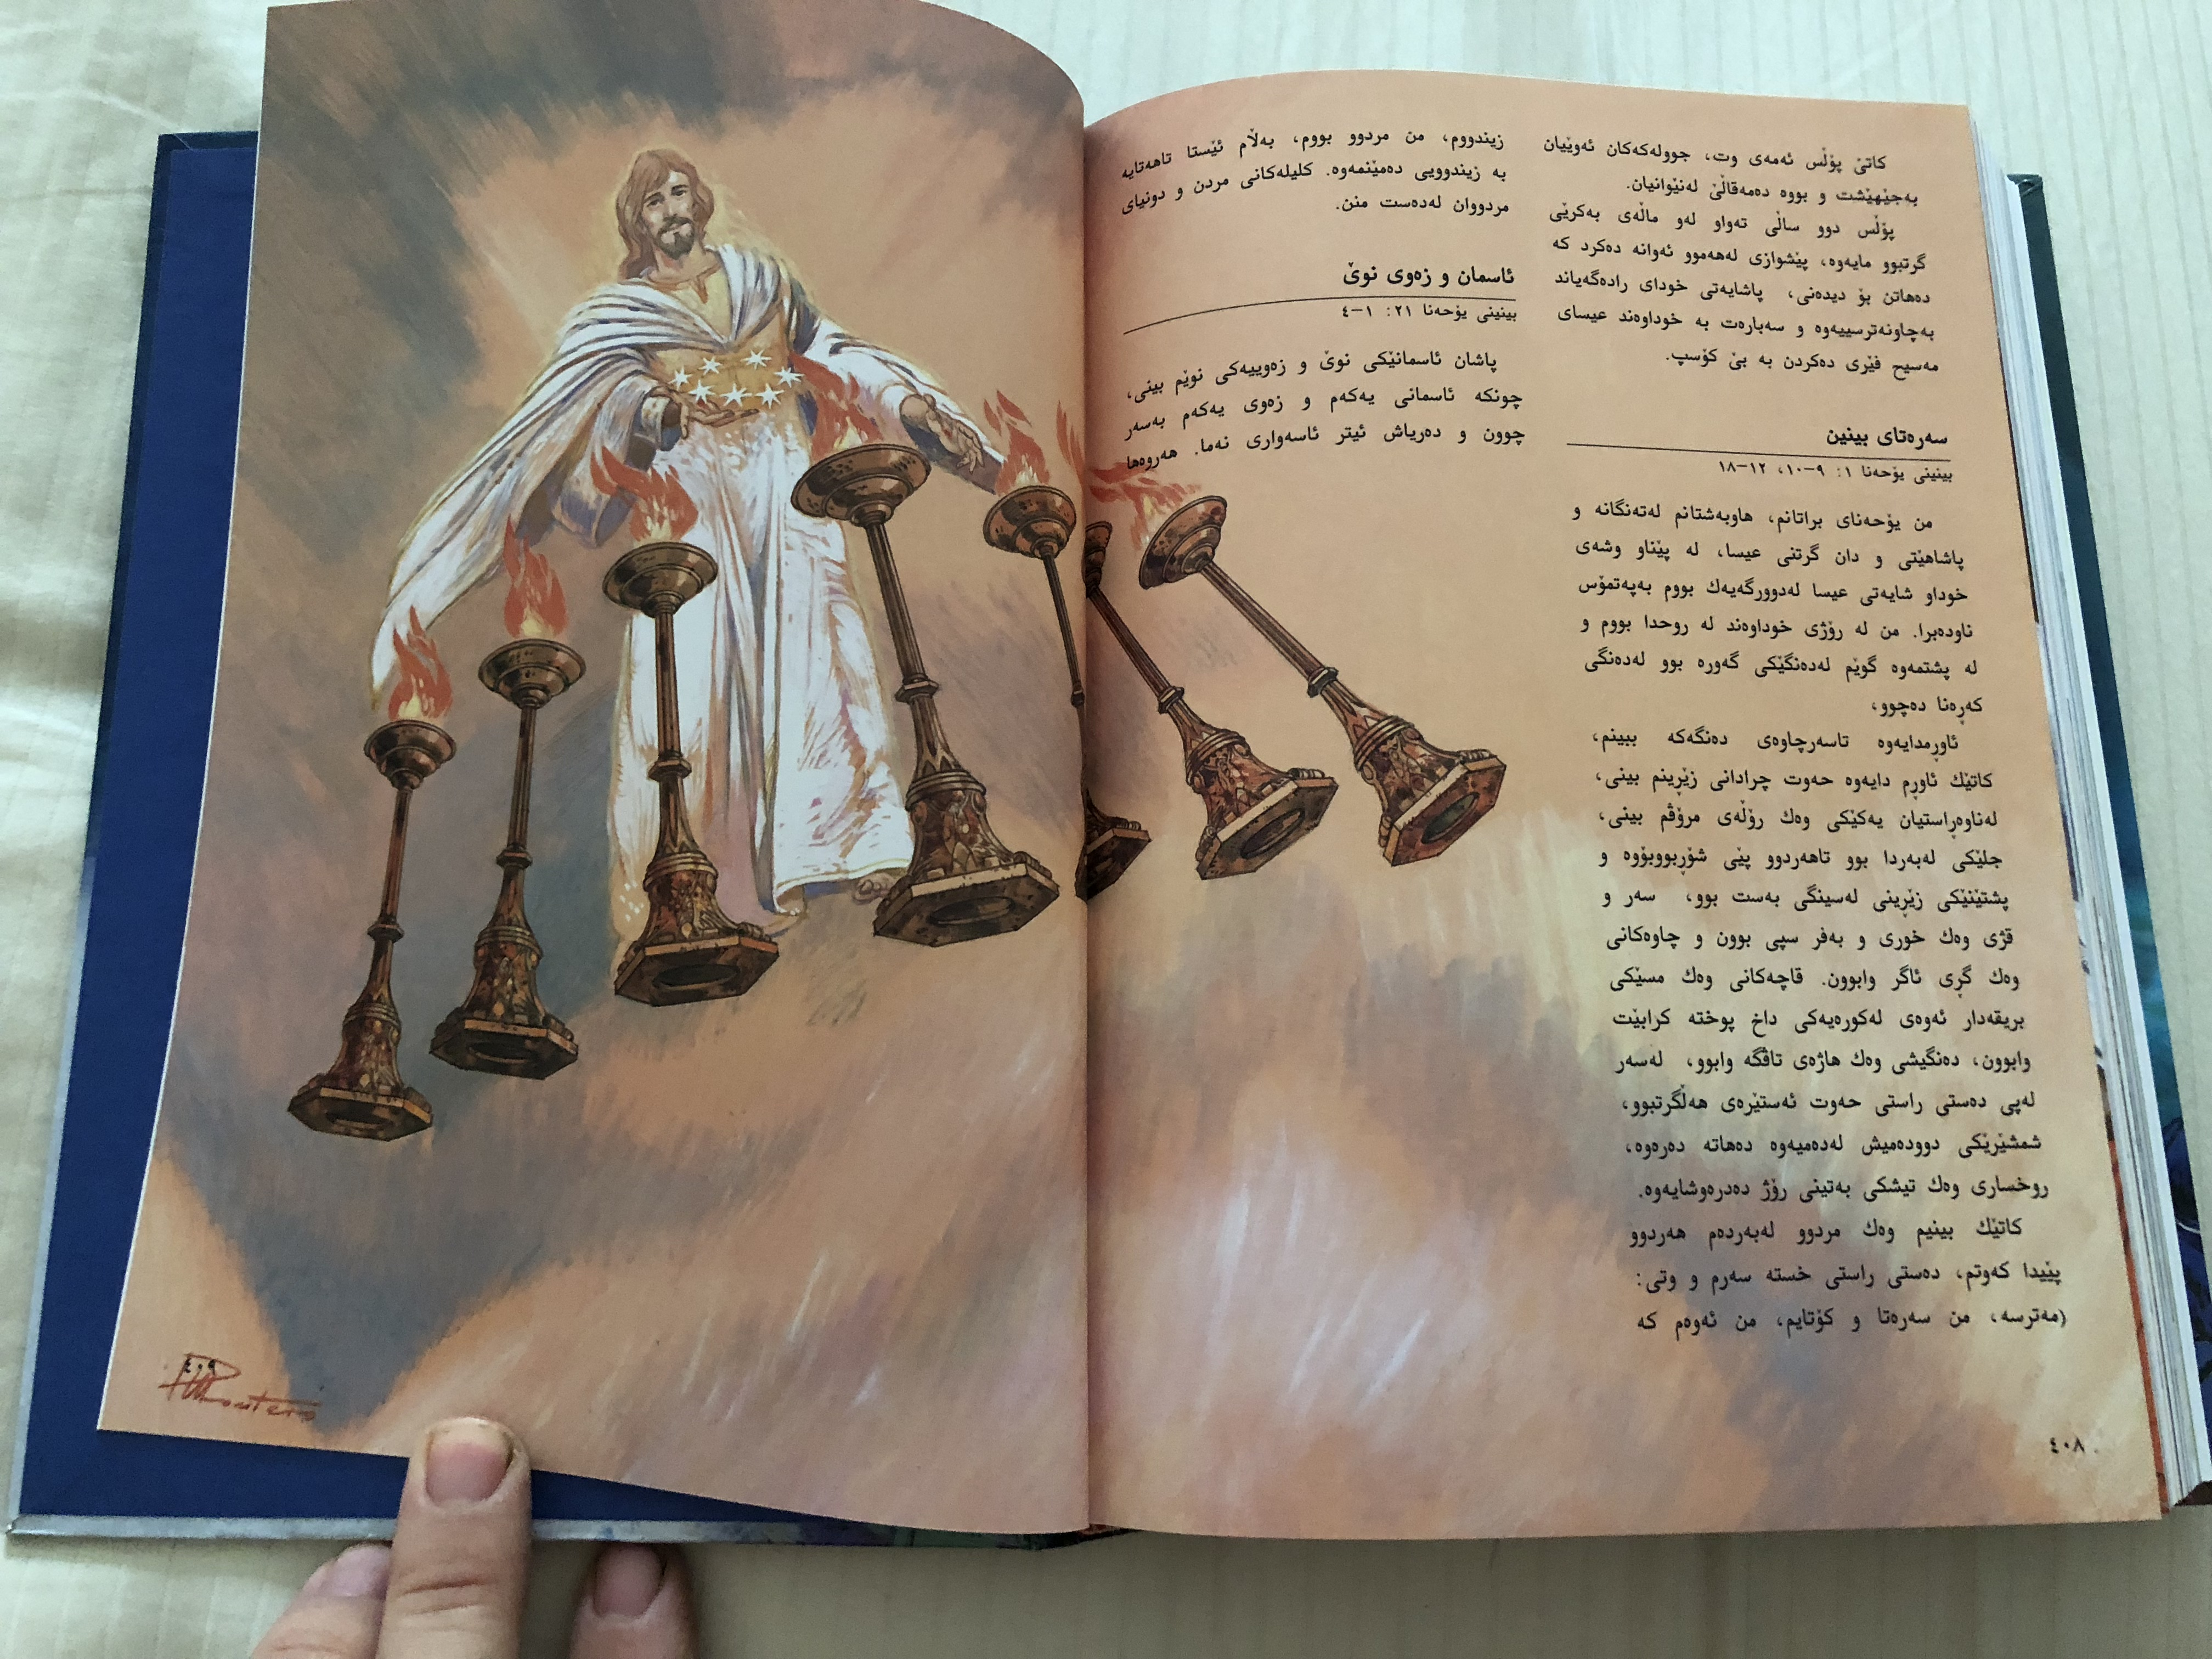 kurdish-children-s-bible-15-.jpg